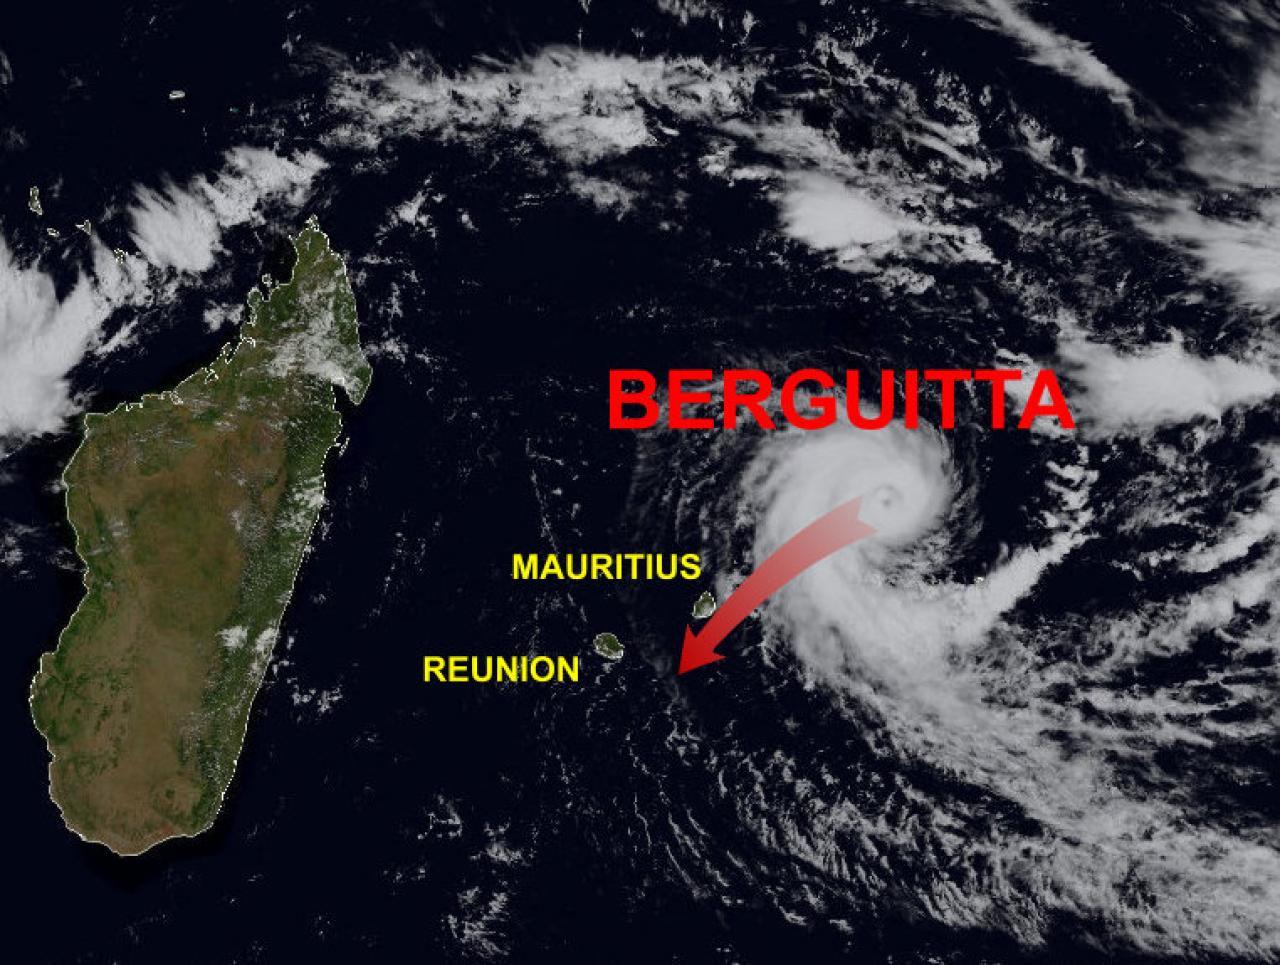 Ciclone tropicale Berguitta, categoria 3, a due passi dalle Isole Mauritius